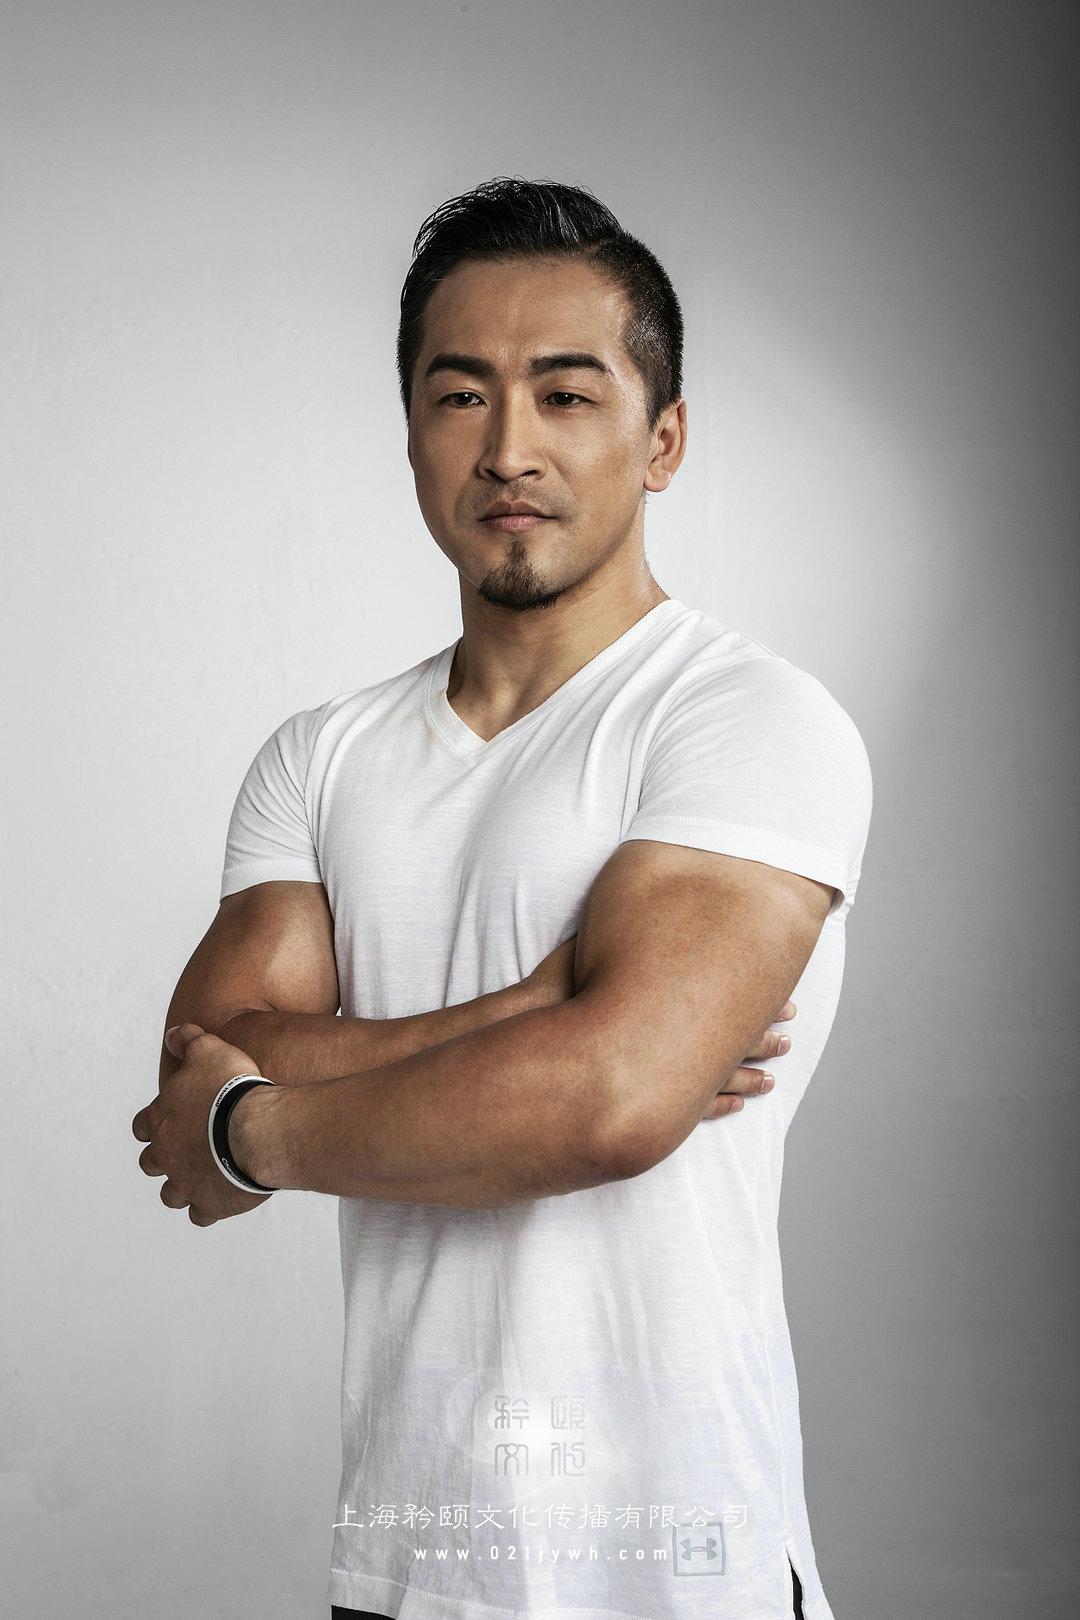 上海肌肉男模